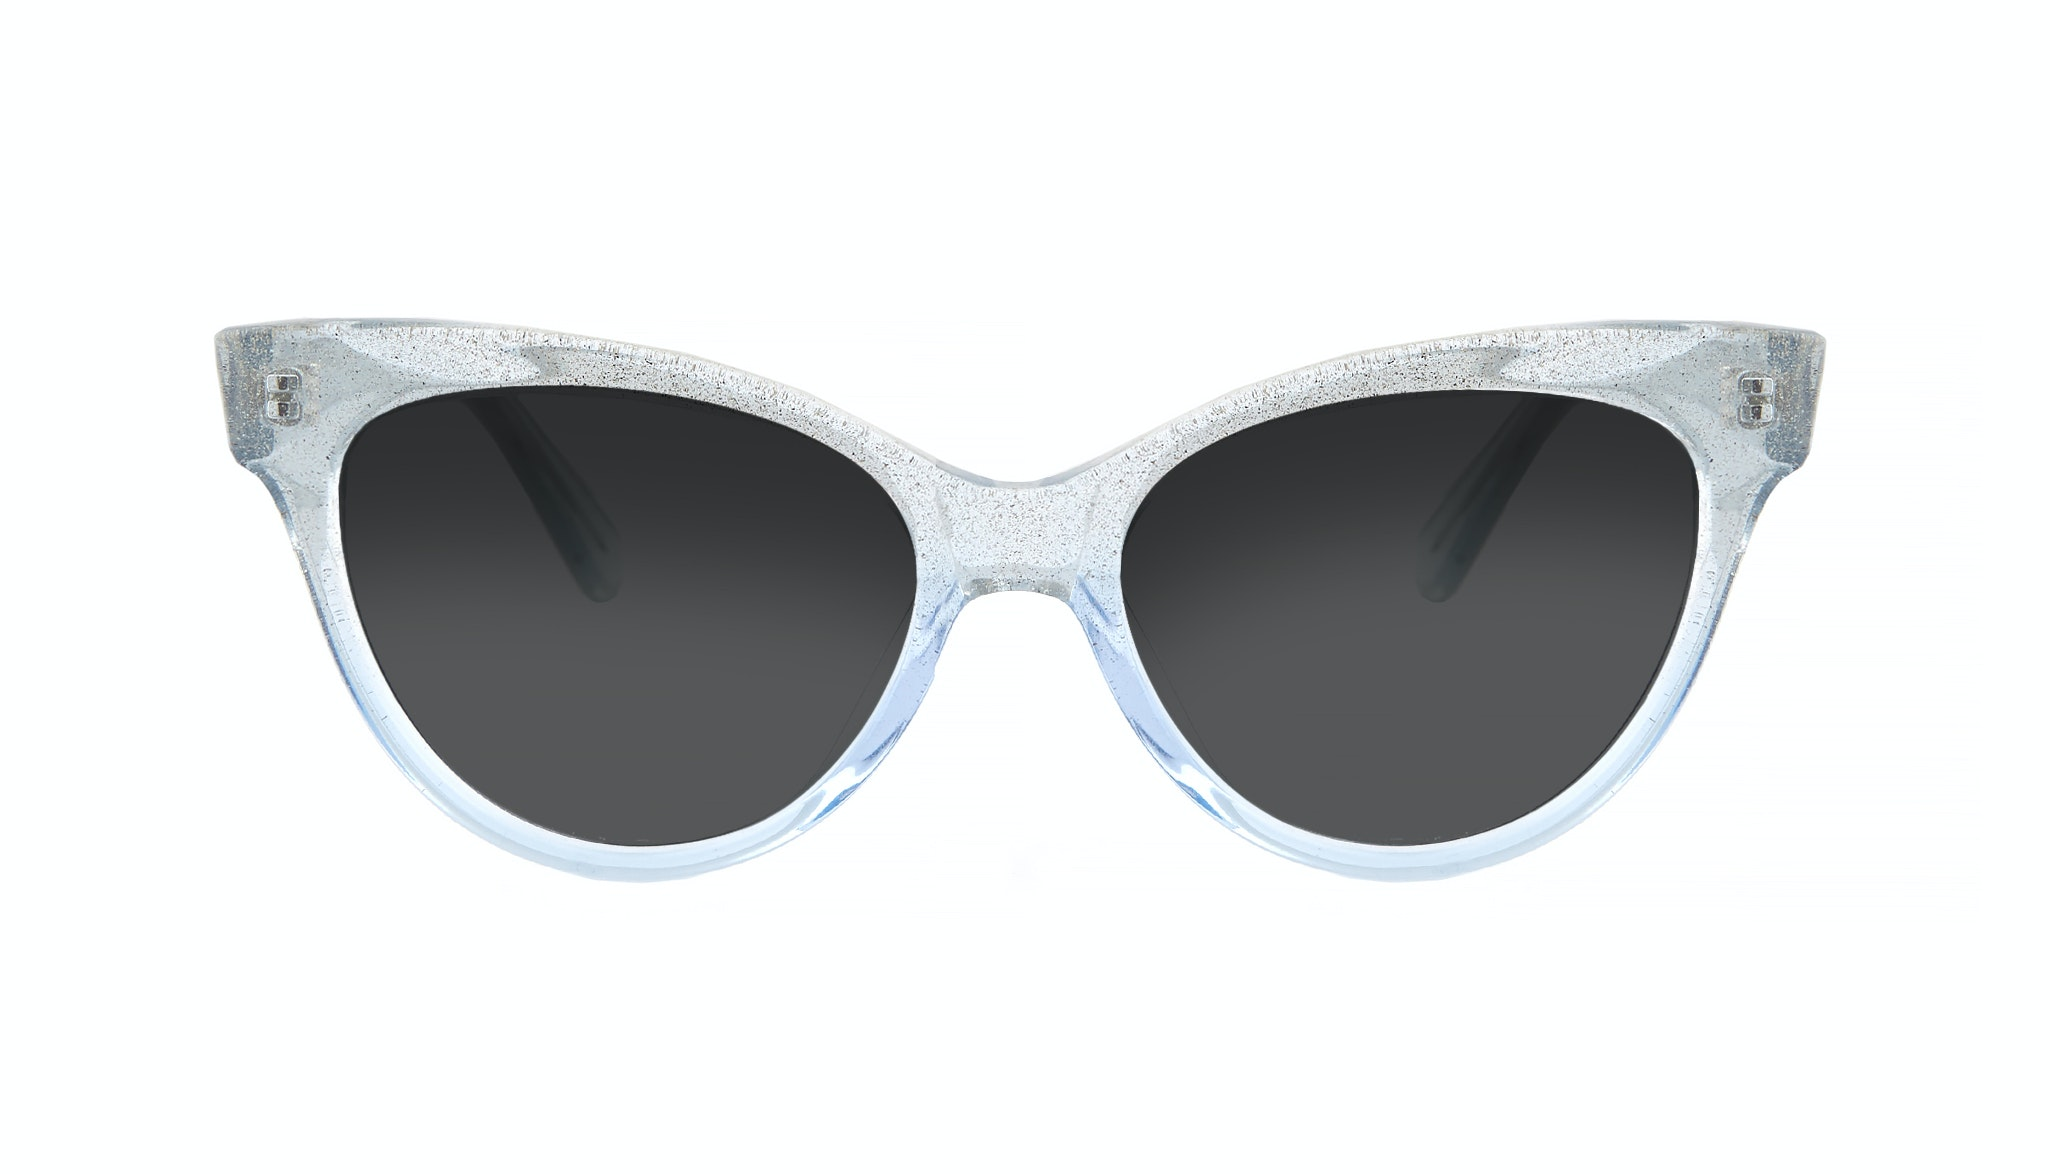 Affordable Fashion Glasses Cat Eye Daring Cateye Sunglasses Women SkunkBoy Larissa Lake Front